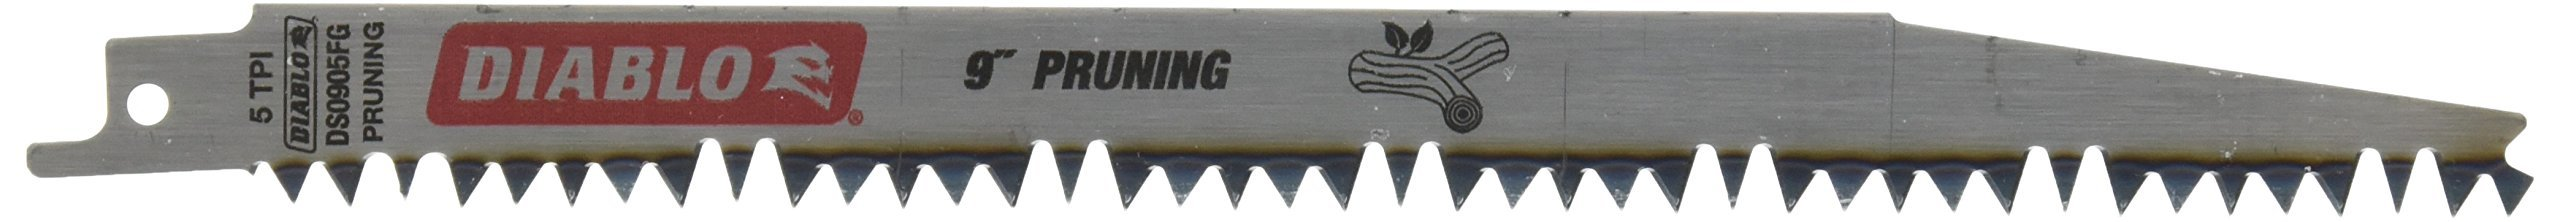 Freud DS0905FG5 Fleam Ground Reciprocating Blade, 9''